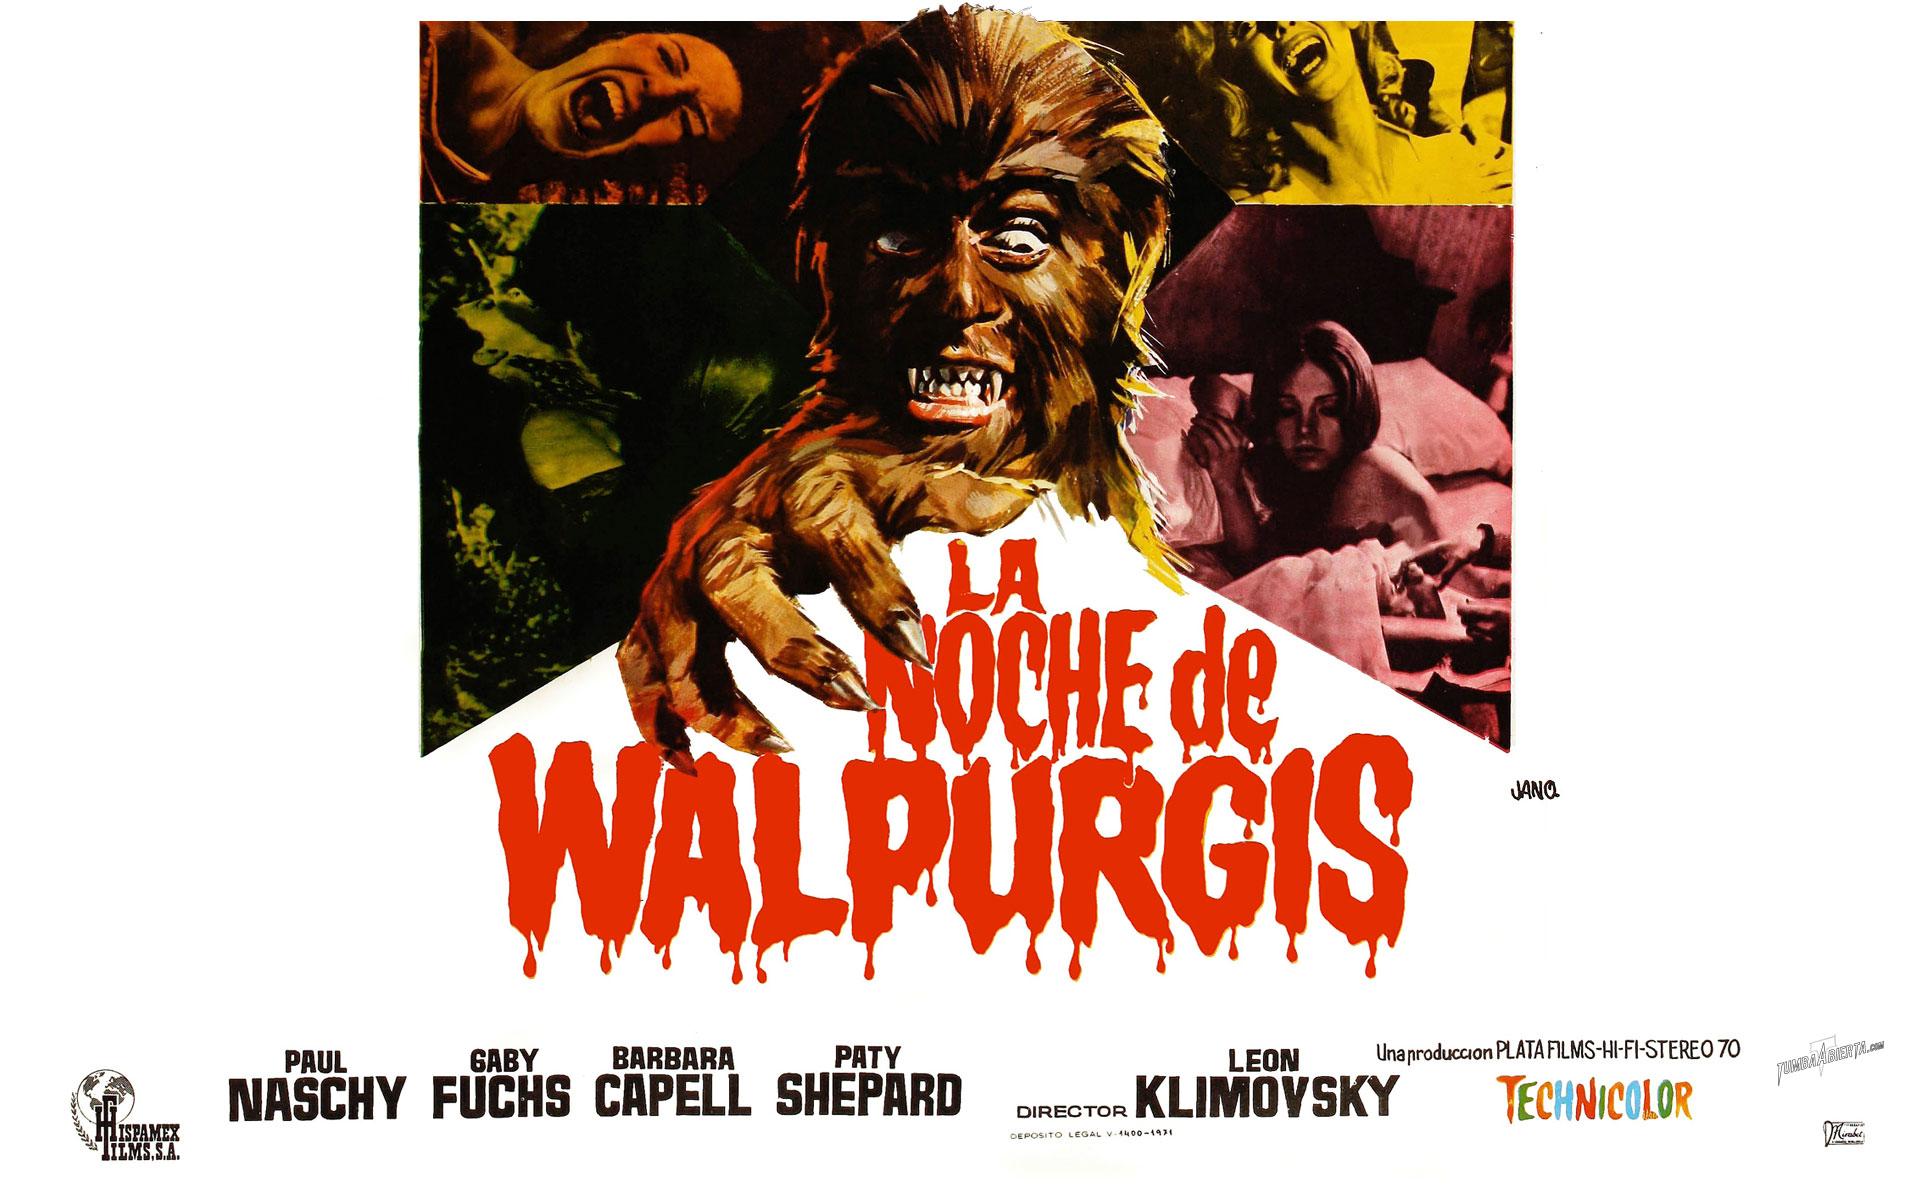 Wallpaper La noche de Walpurgis The Werewolf Vs.Vampire woman) con Paul Naschy